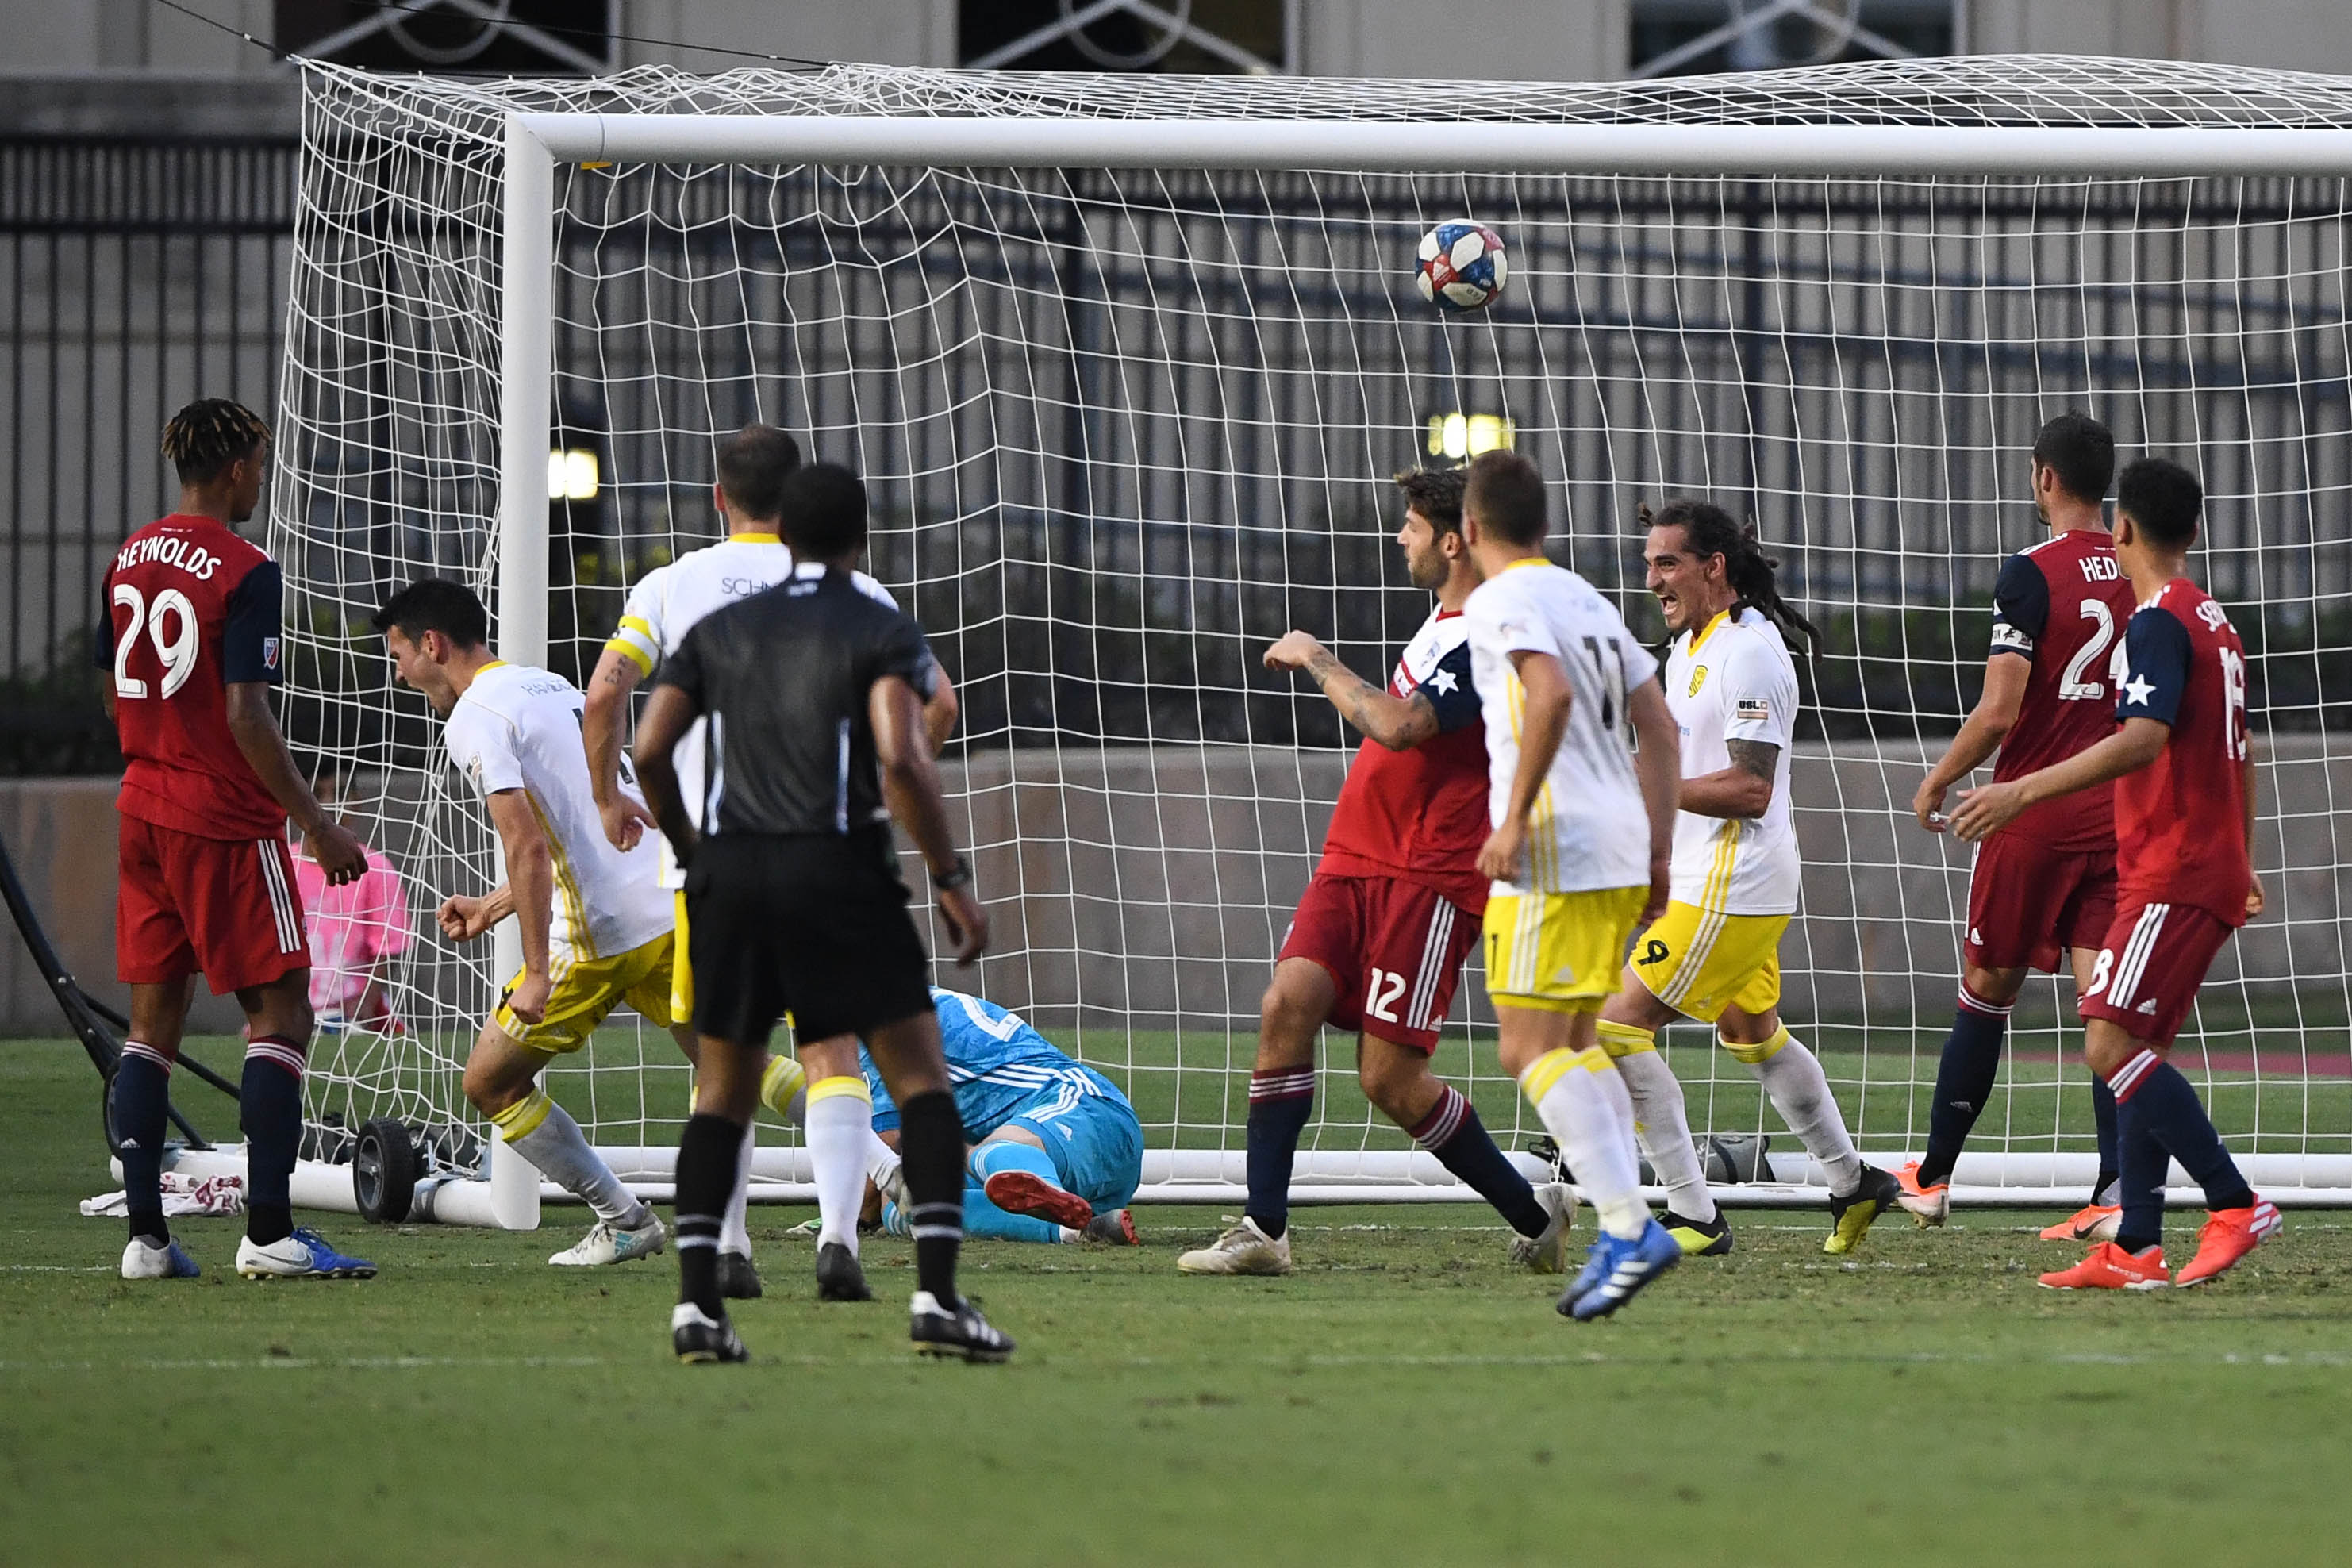 MLS: U.S. Open Cup-New Mexico United at FC Dallas